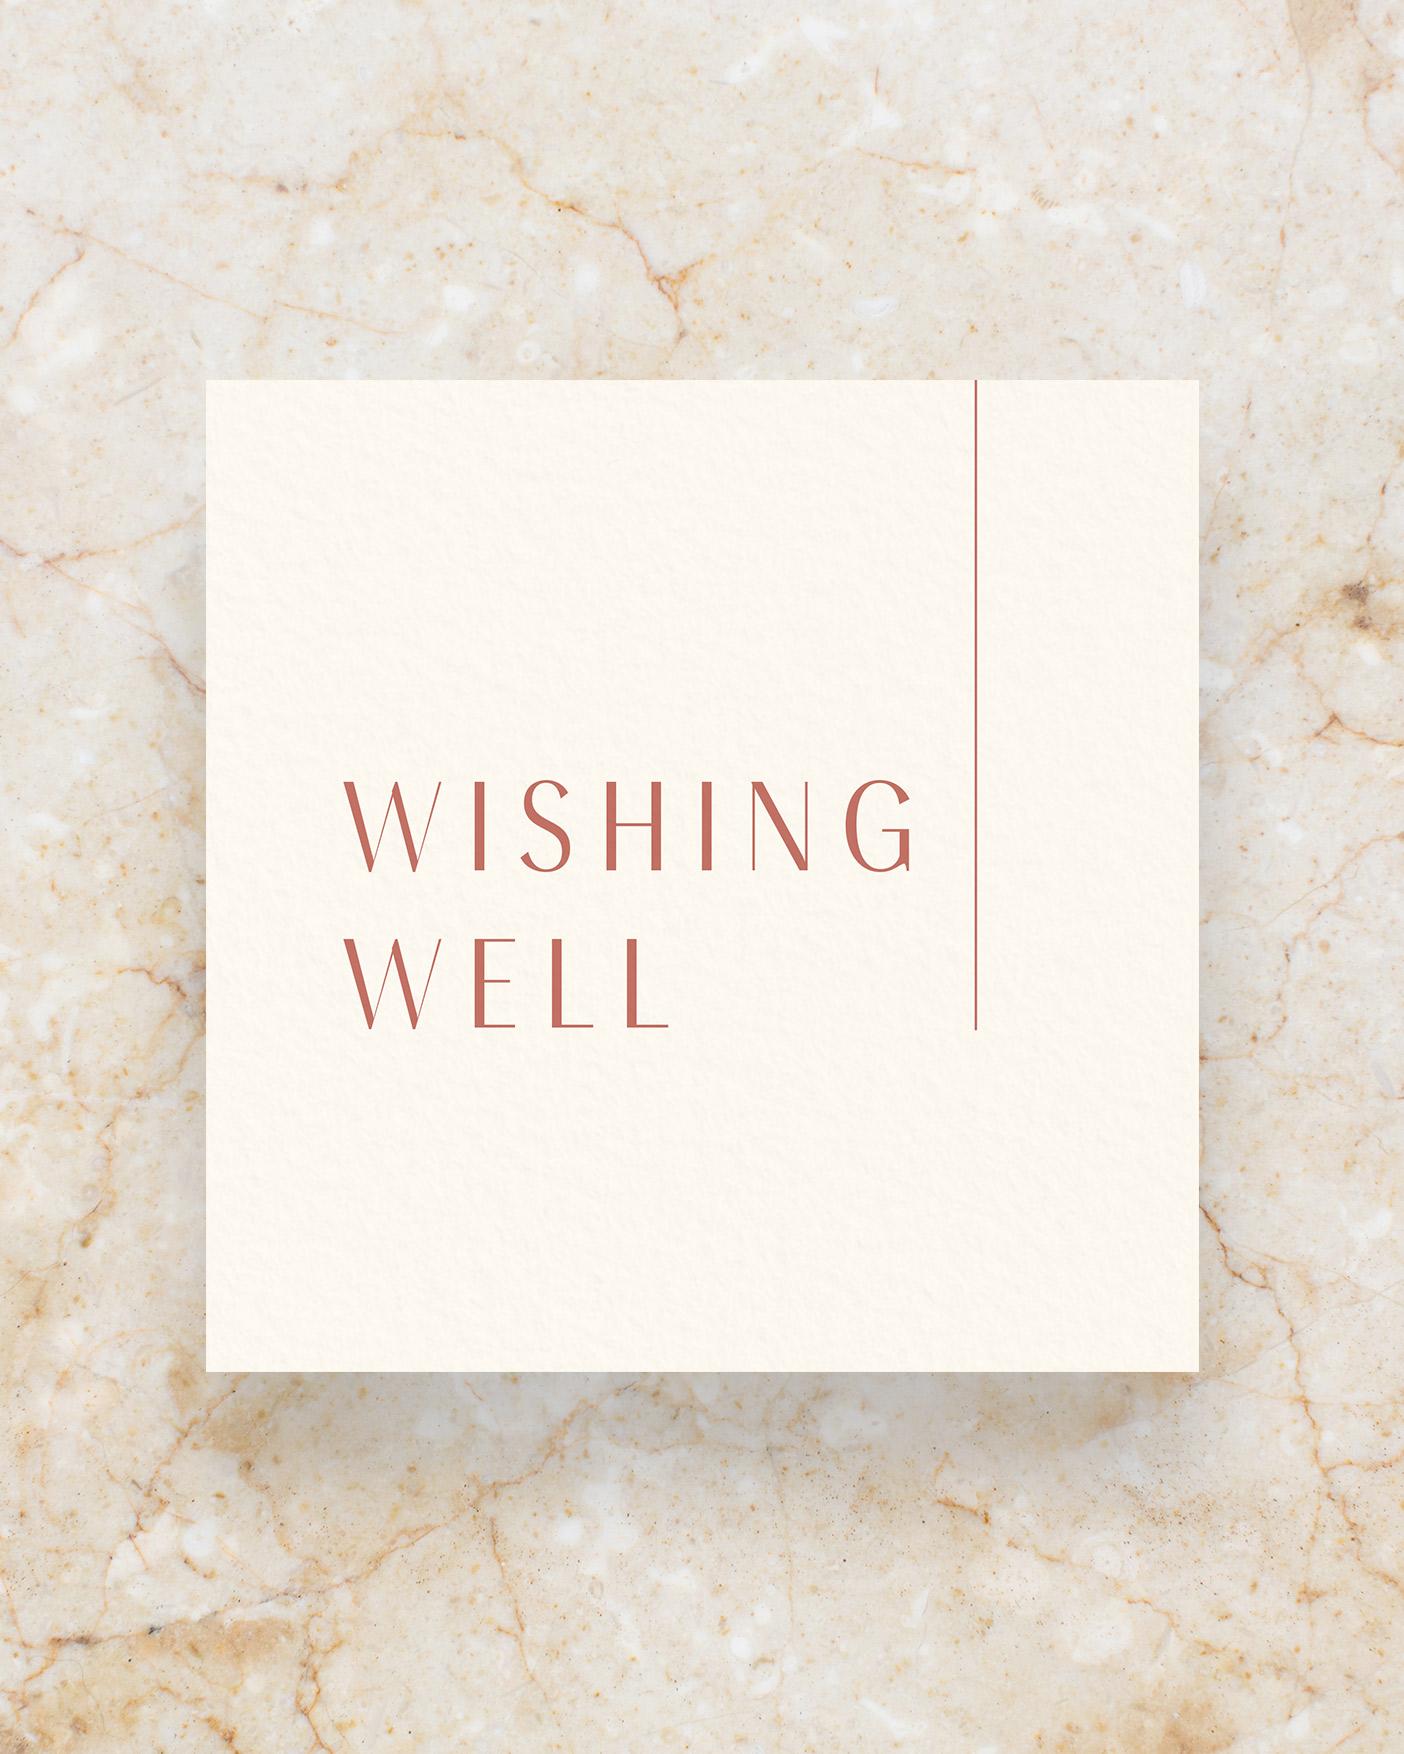 Wishing Well Sign